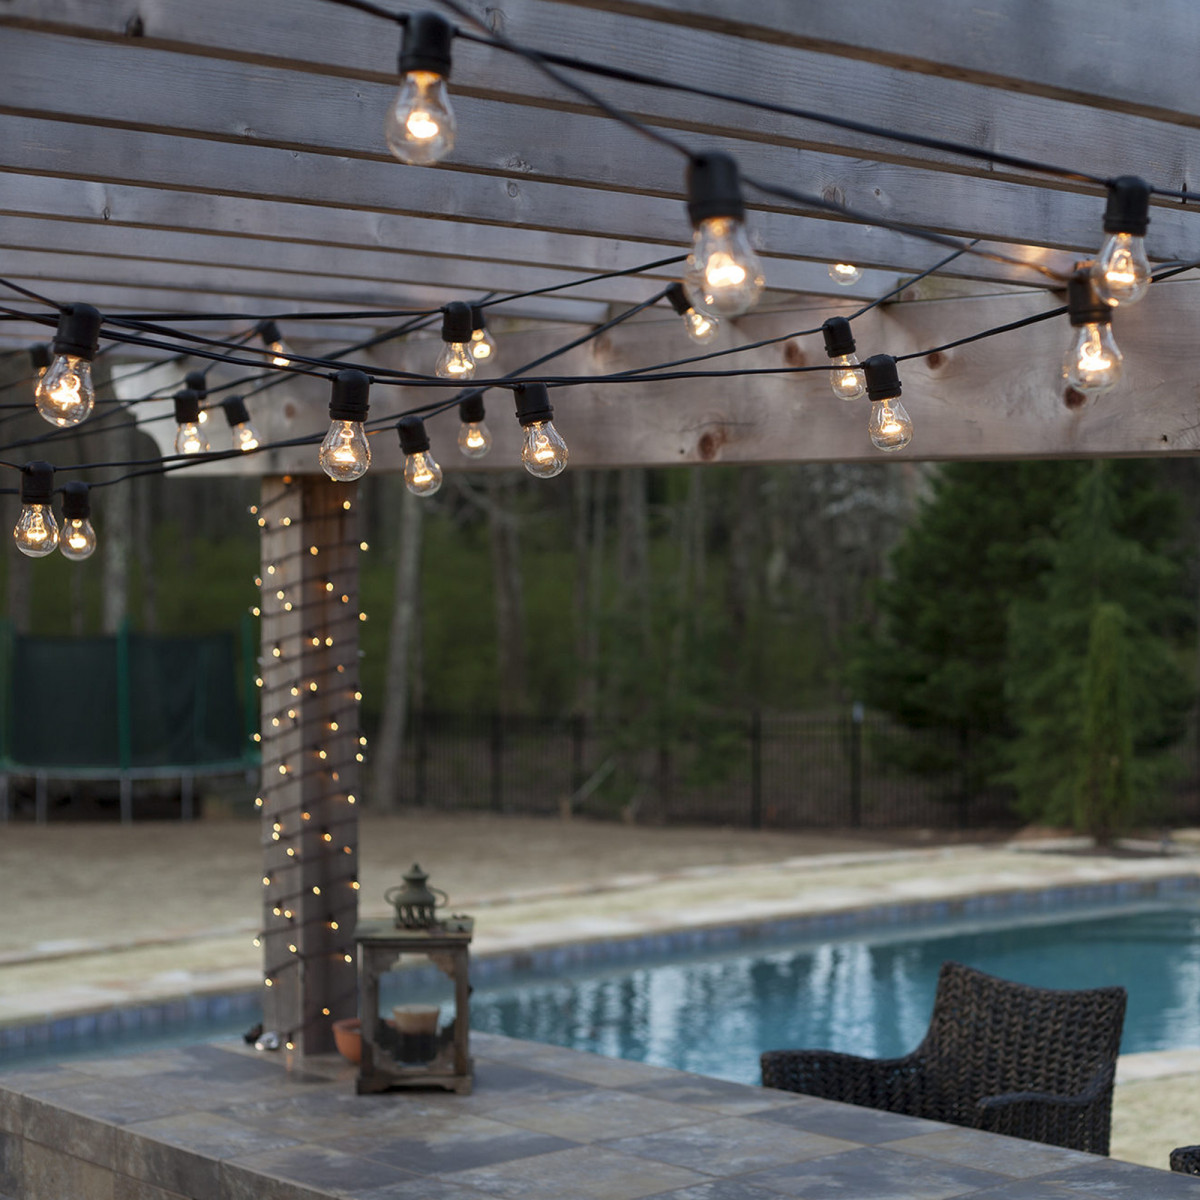 Partybeleuchtung LED Patio 30 transparent - 30 Meter / 36 Leuchten